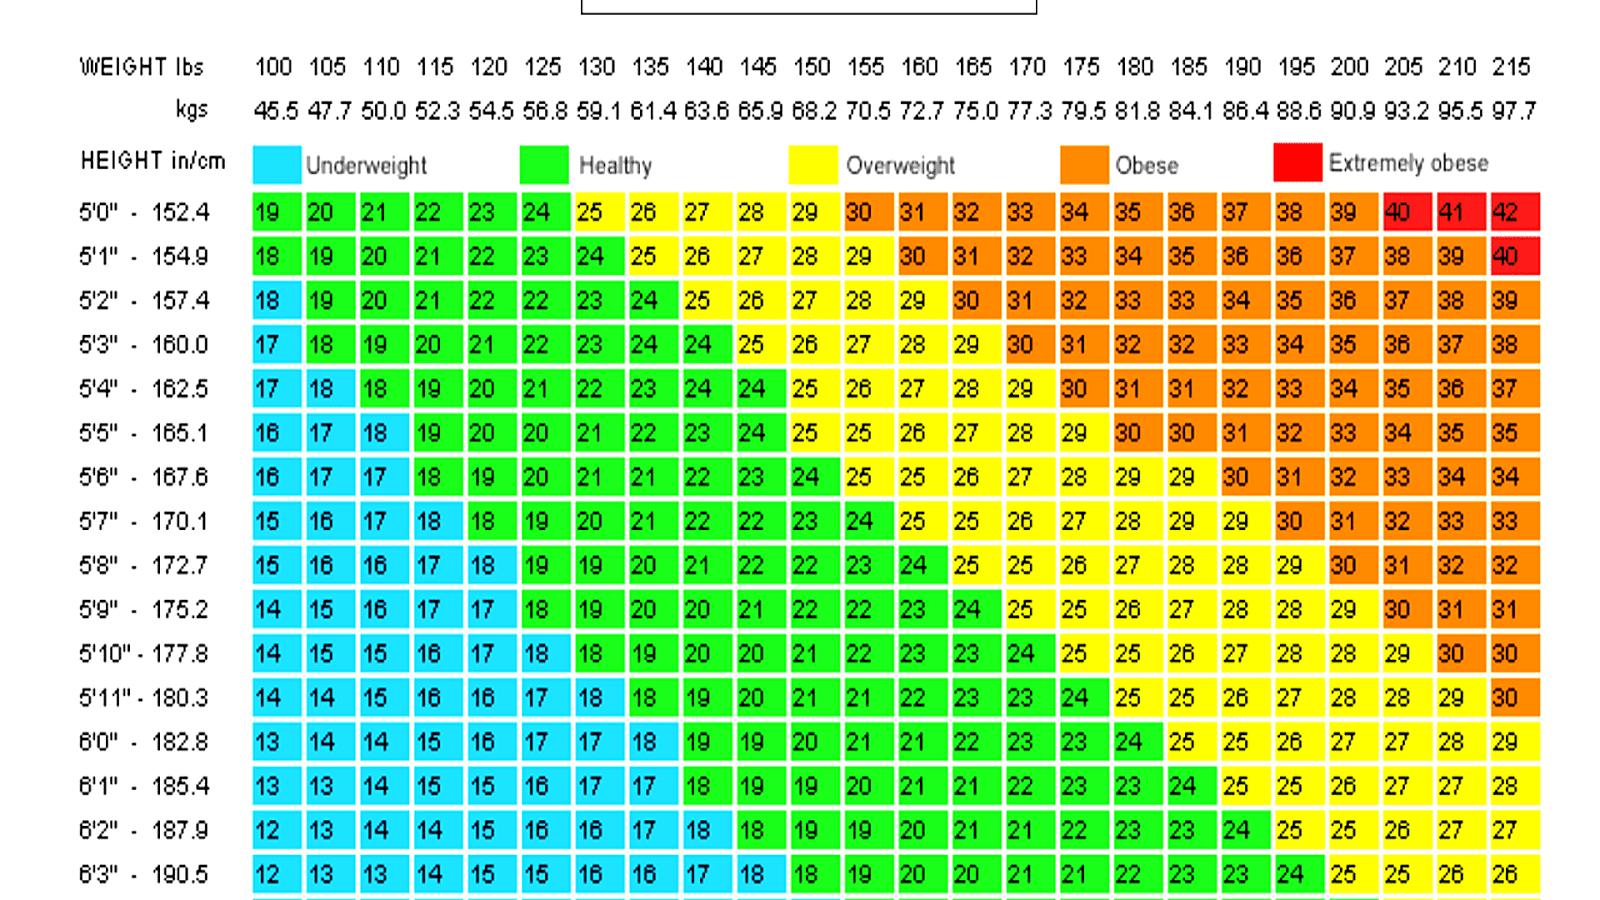 Bmi index male chart nvjuhfo Gallery